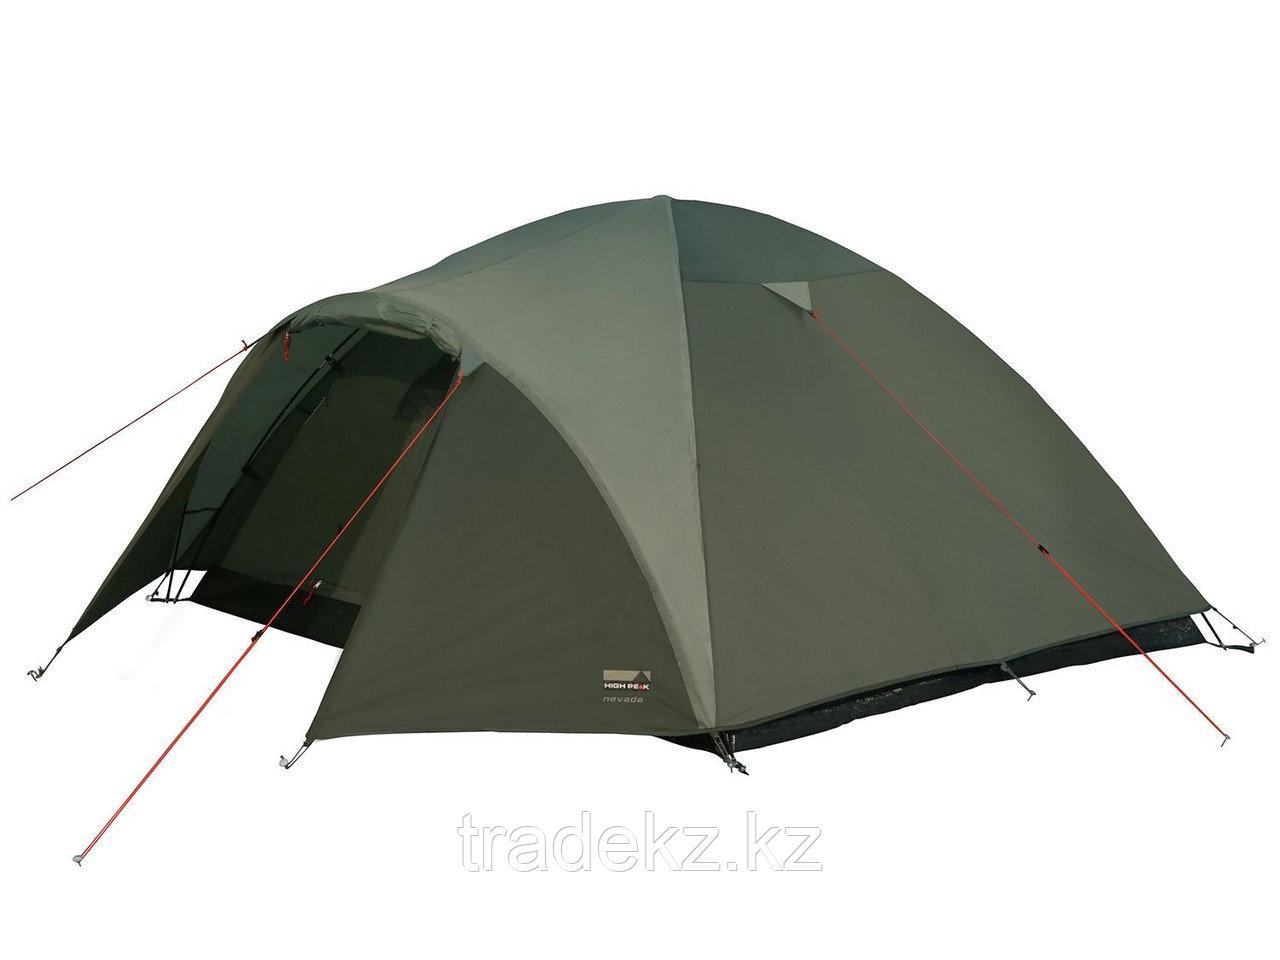 Палатка 3-х местная HIGH PEAK NEVADA 3, цвет темно-оливковый/светло-оливковый